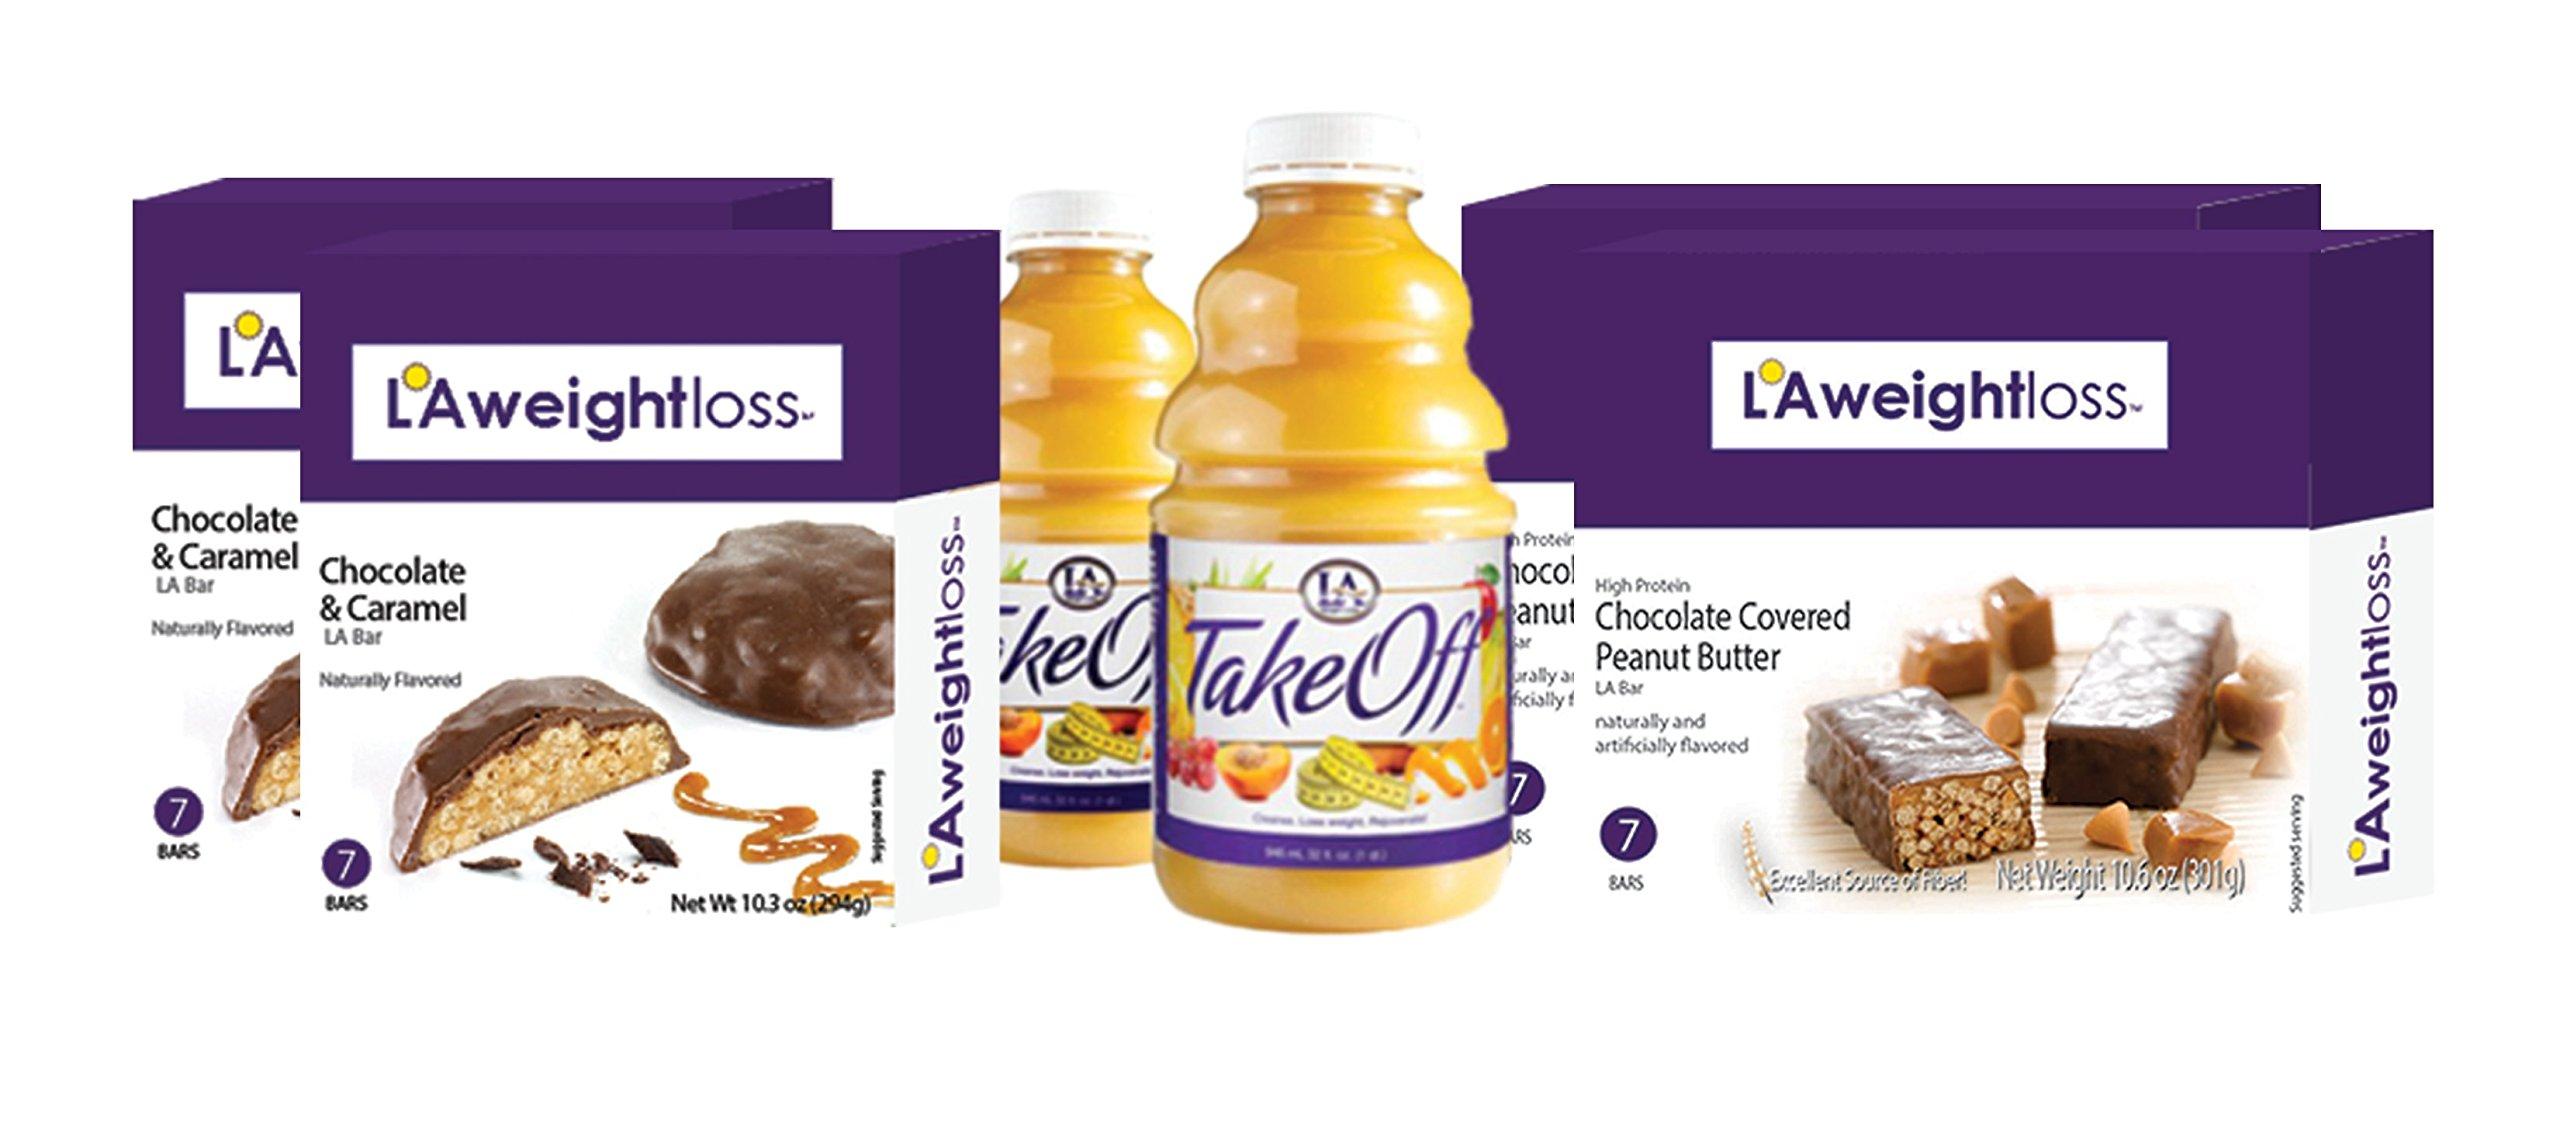 LA Weight Loss Combo Pack - LA Bars & TakeOff Cleanse